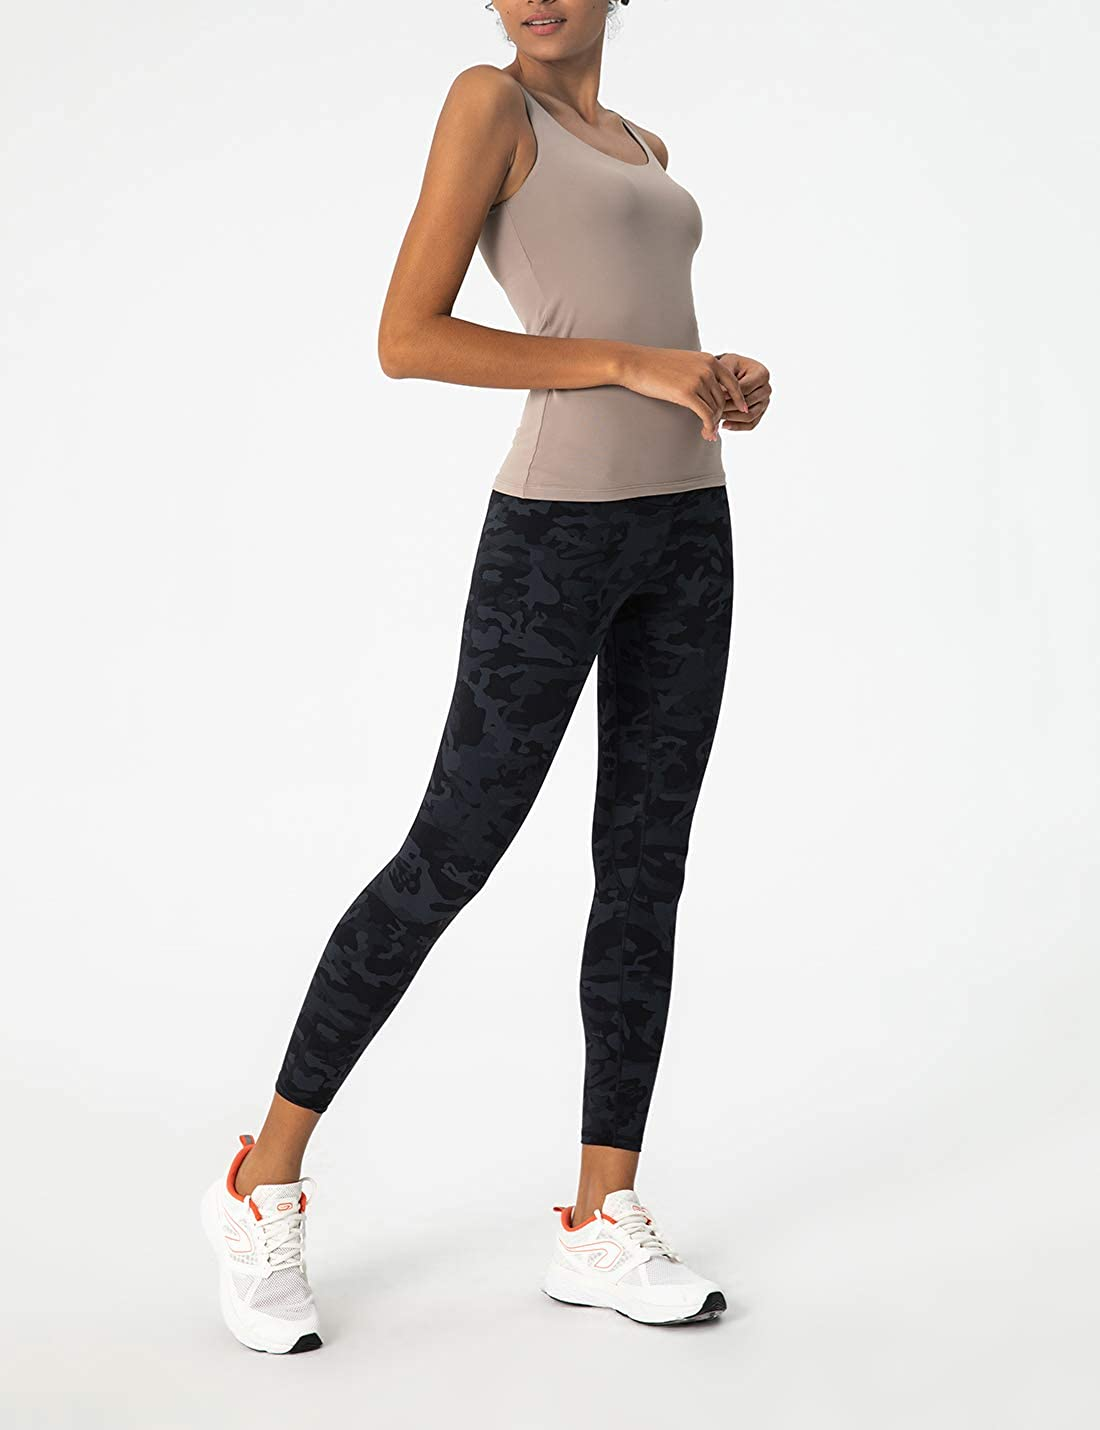 AJISAI Womens High Waist Workout Leggings Yoga Pants Tummy Control Running Pants 25 inches